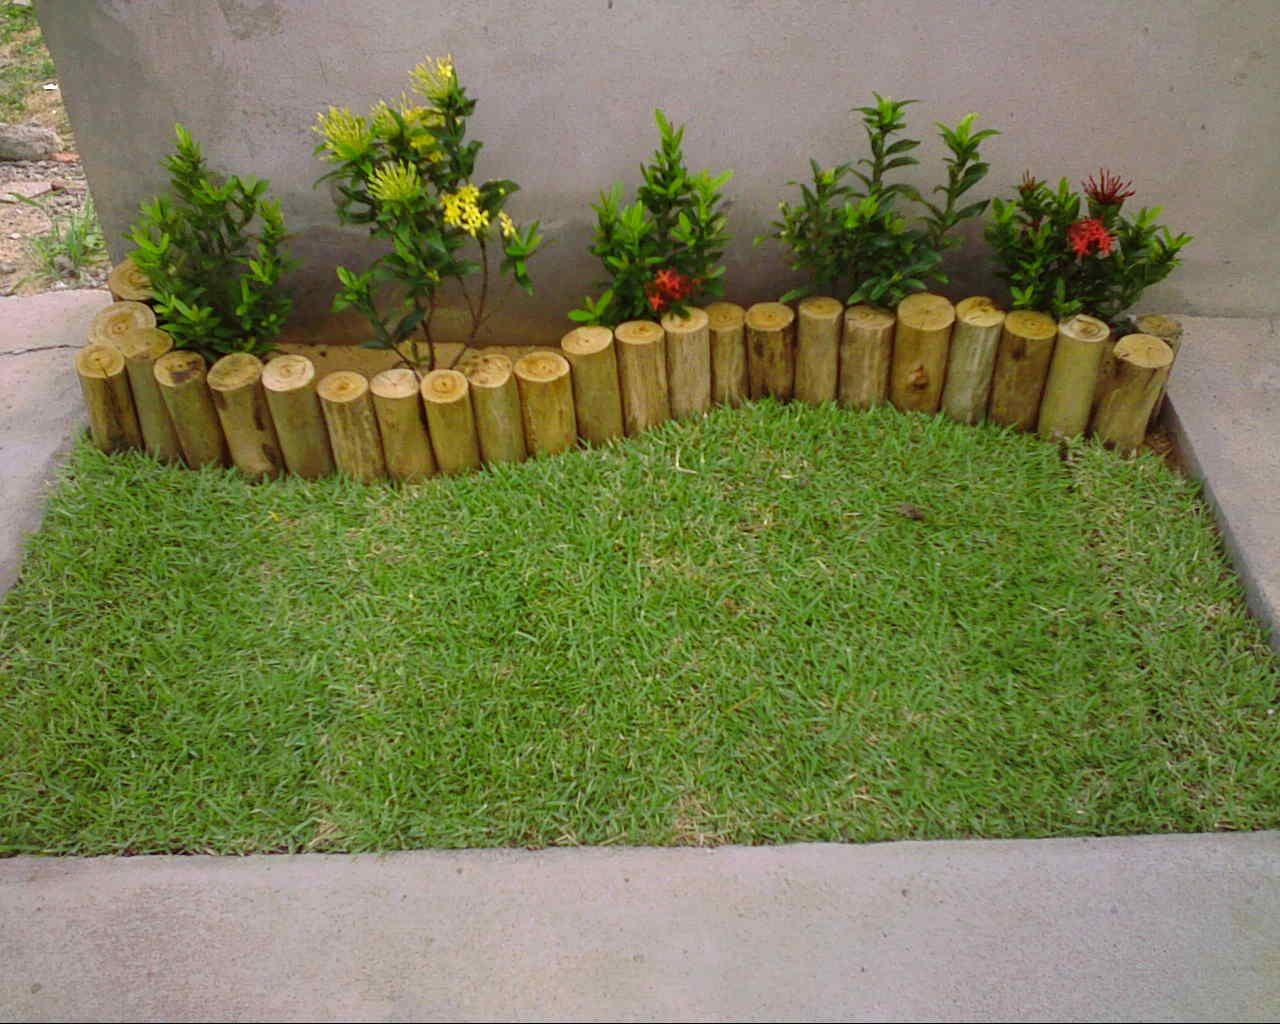 Jardins pequenos pesquisa google meu jardim - Decorar jardin barato ...